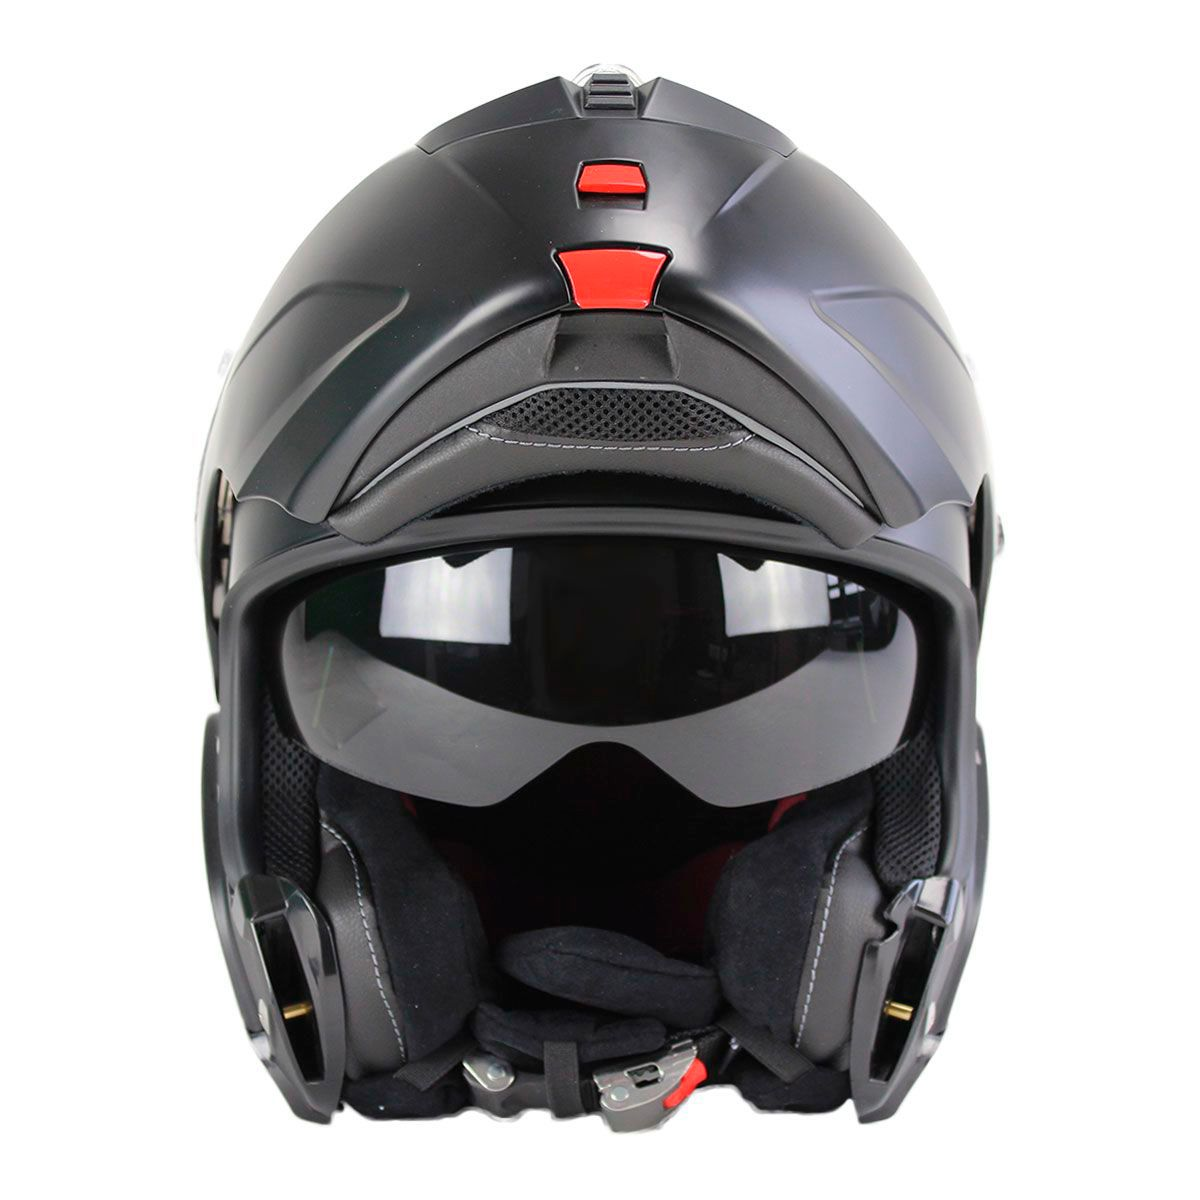 Capacete X-Lite X-1004 Elegance - Preto/Fosco  - Planet Bike Shop Moto Acessórios